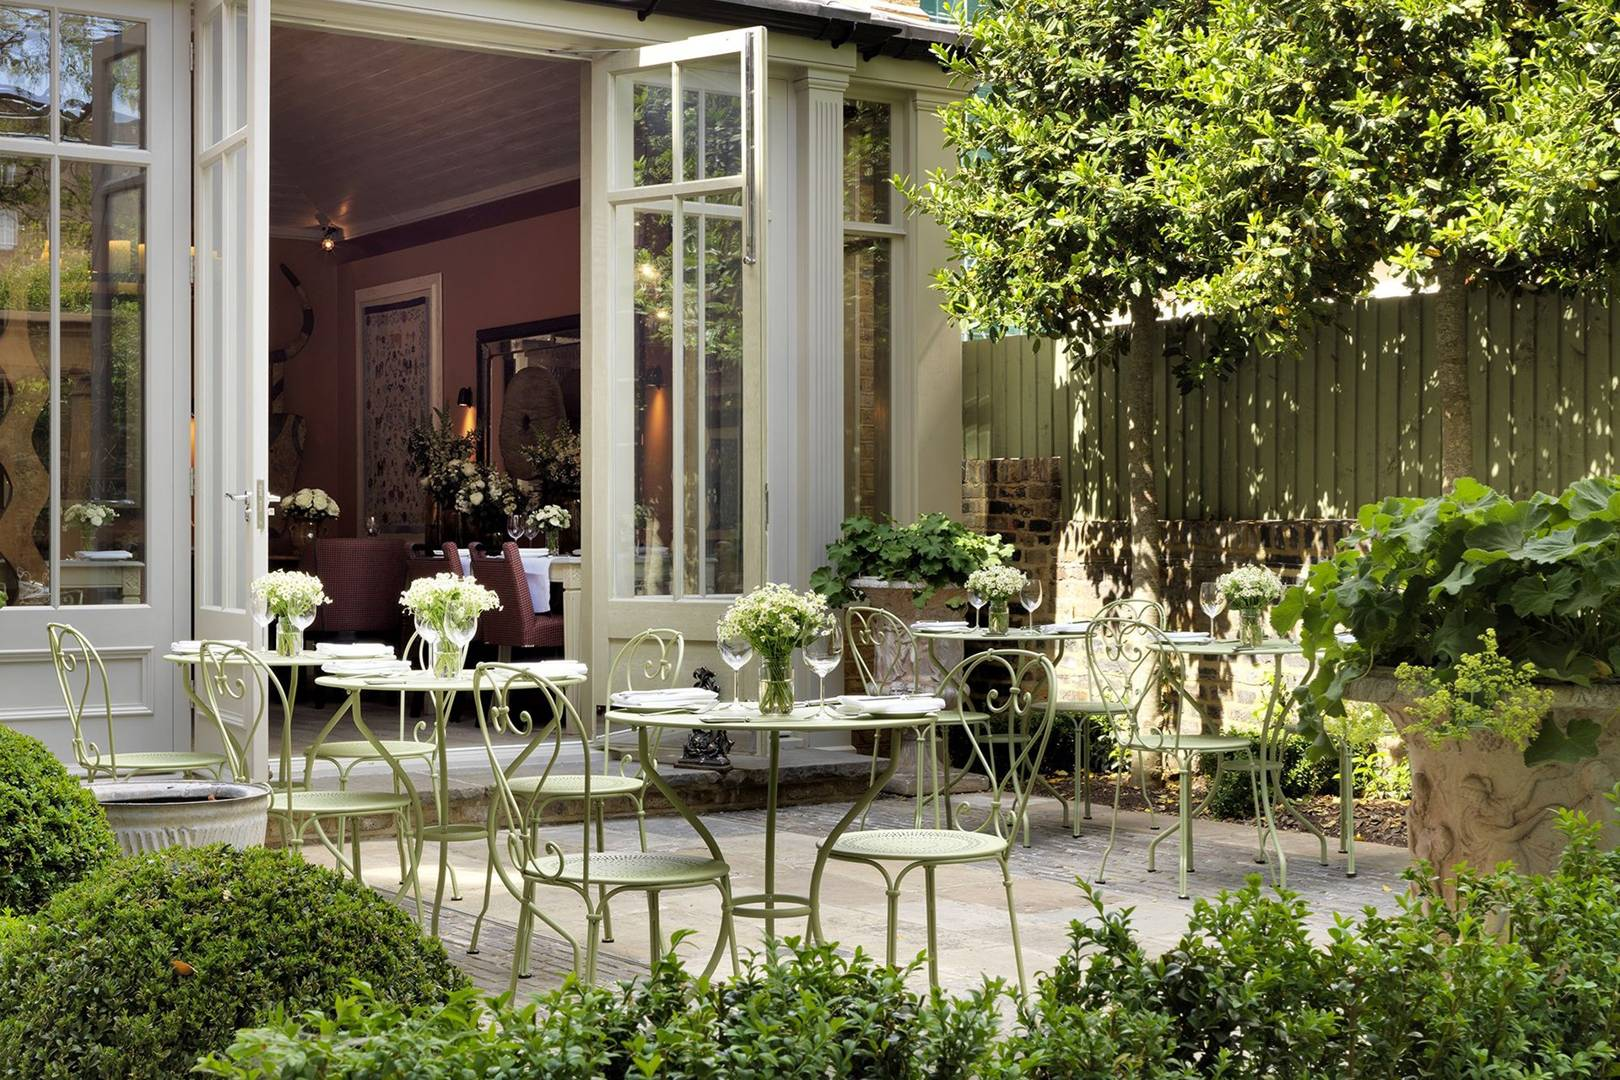 London restaurants with gardens cn traveller